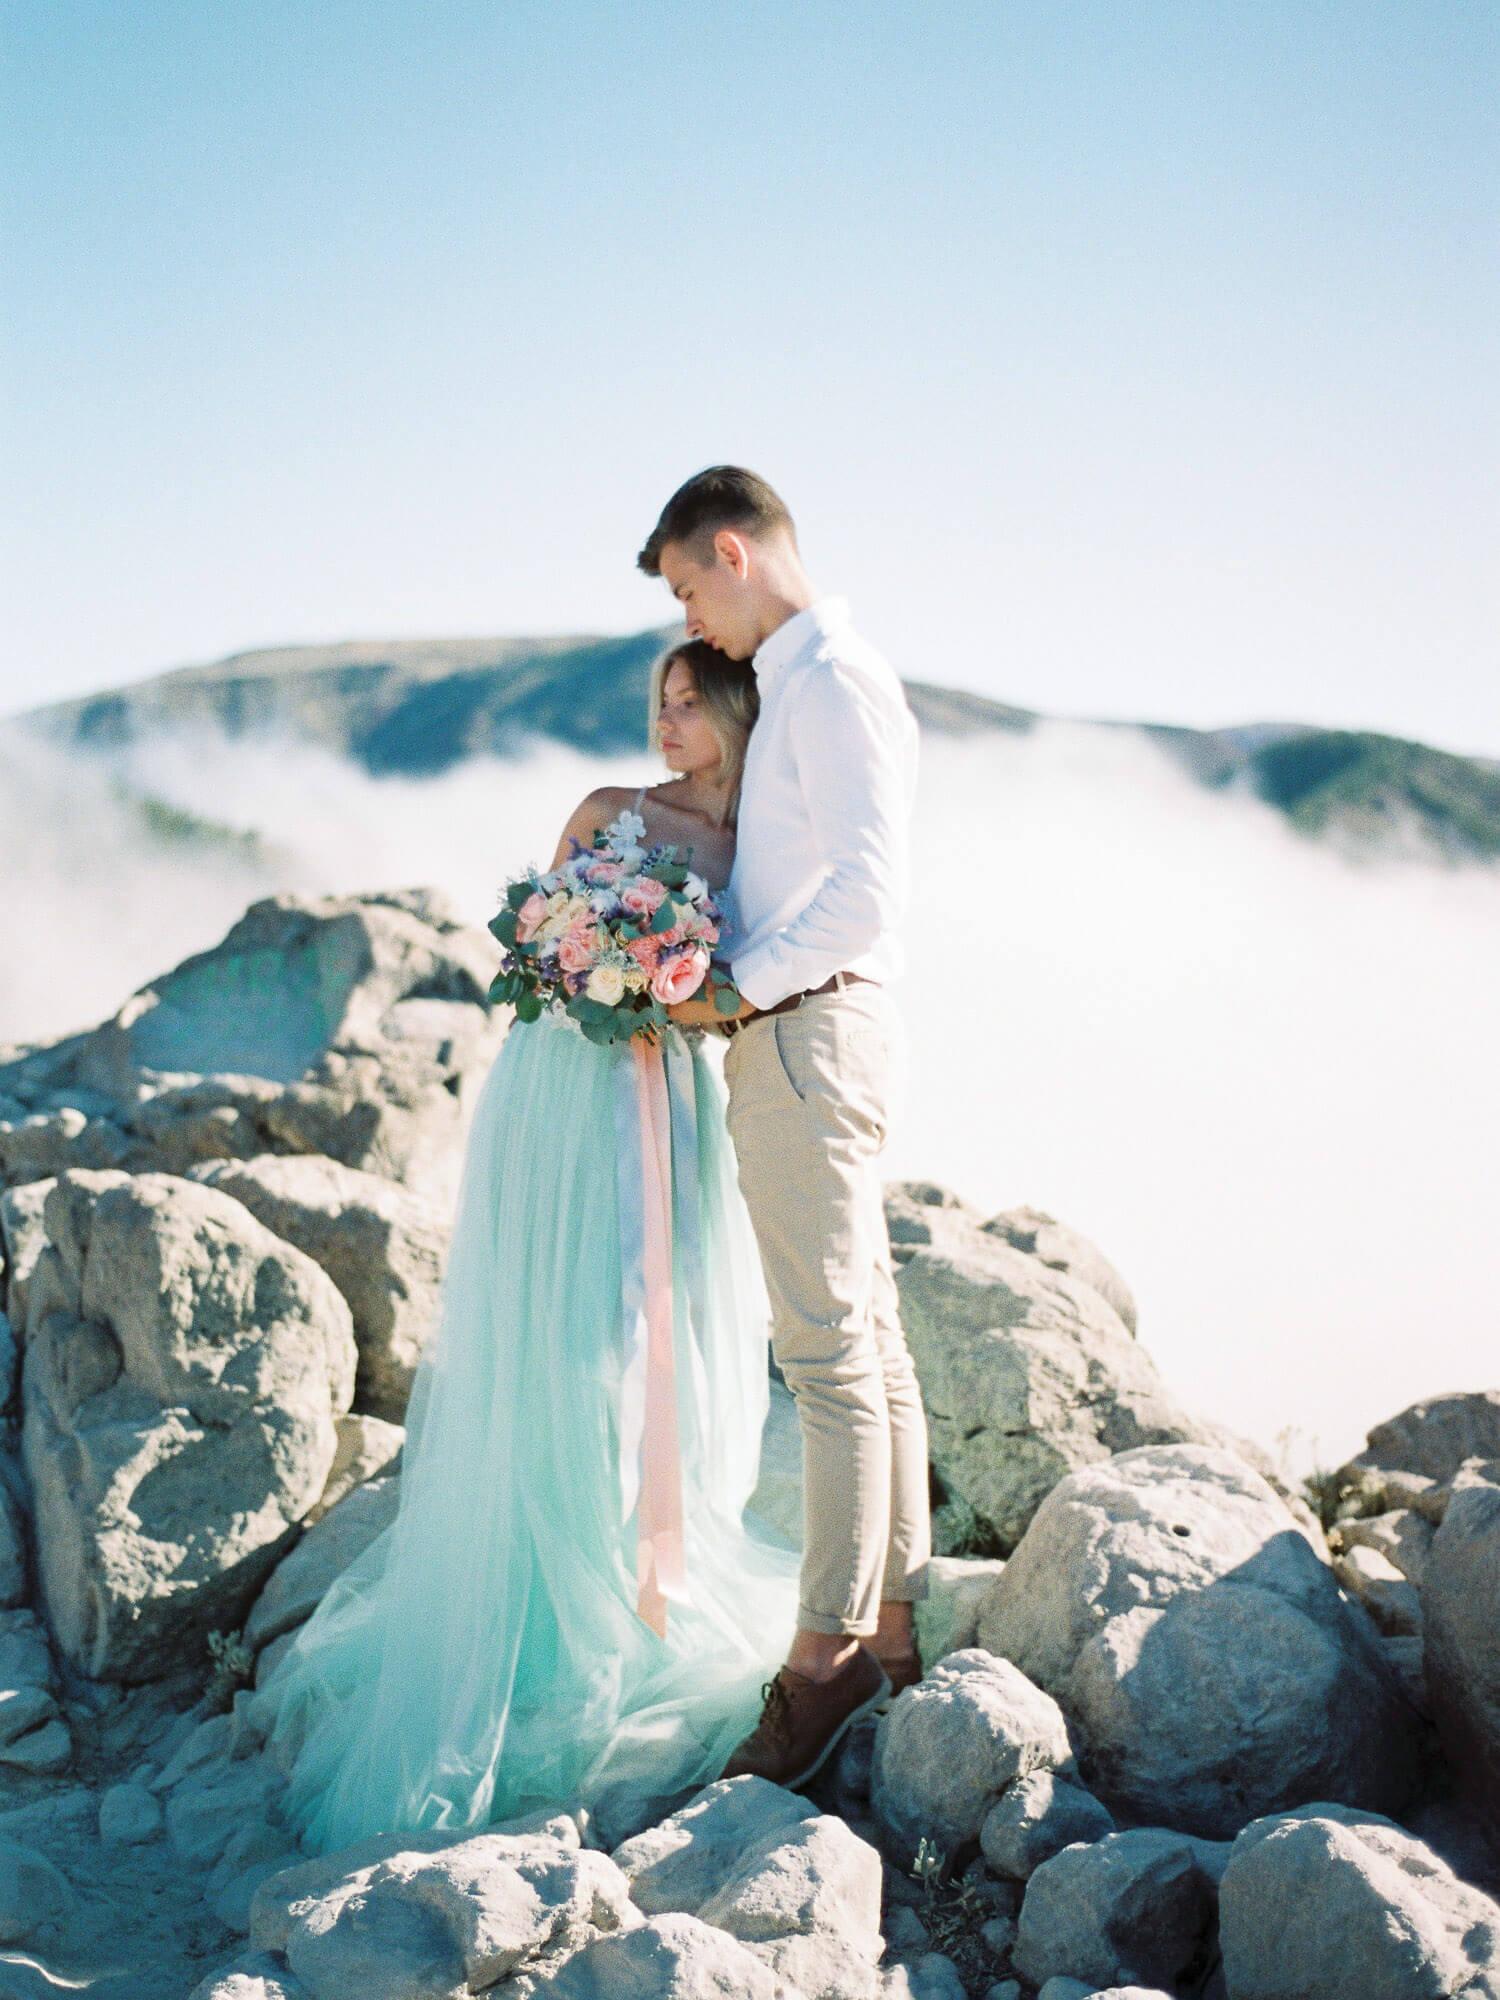 wedding photoshoot in Tenerife, volcano Teide